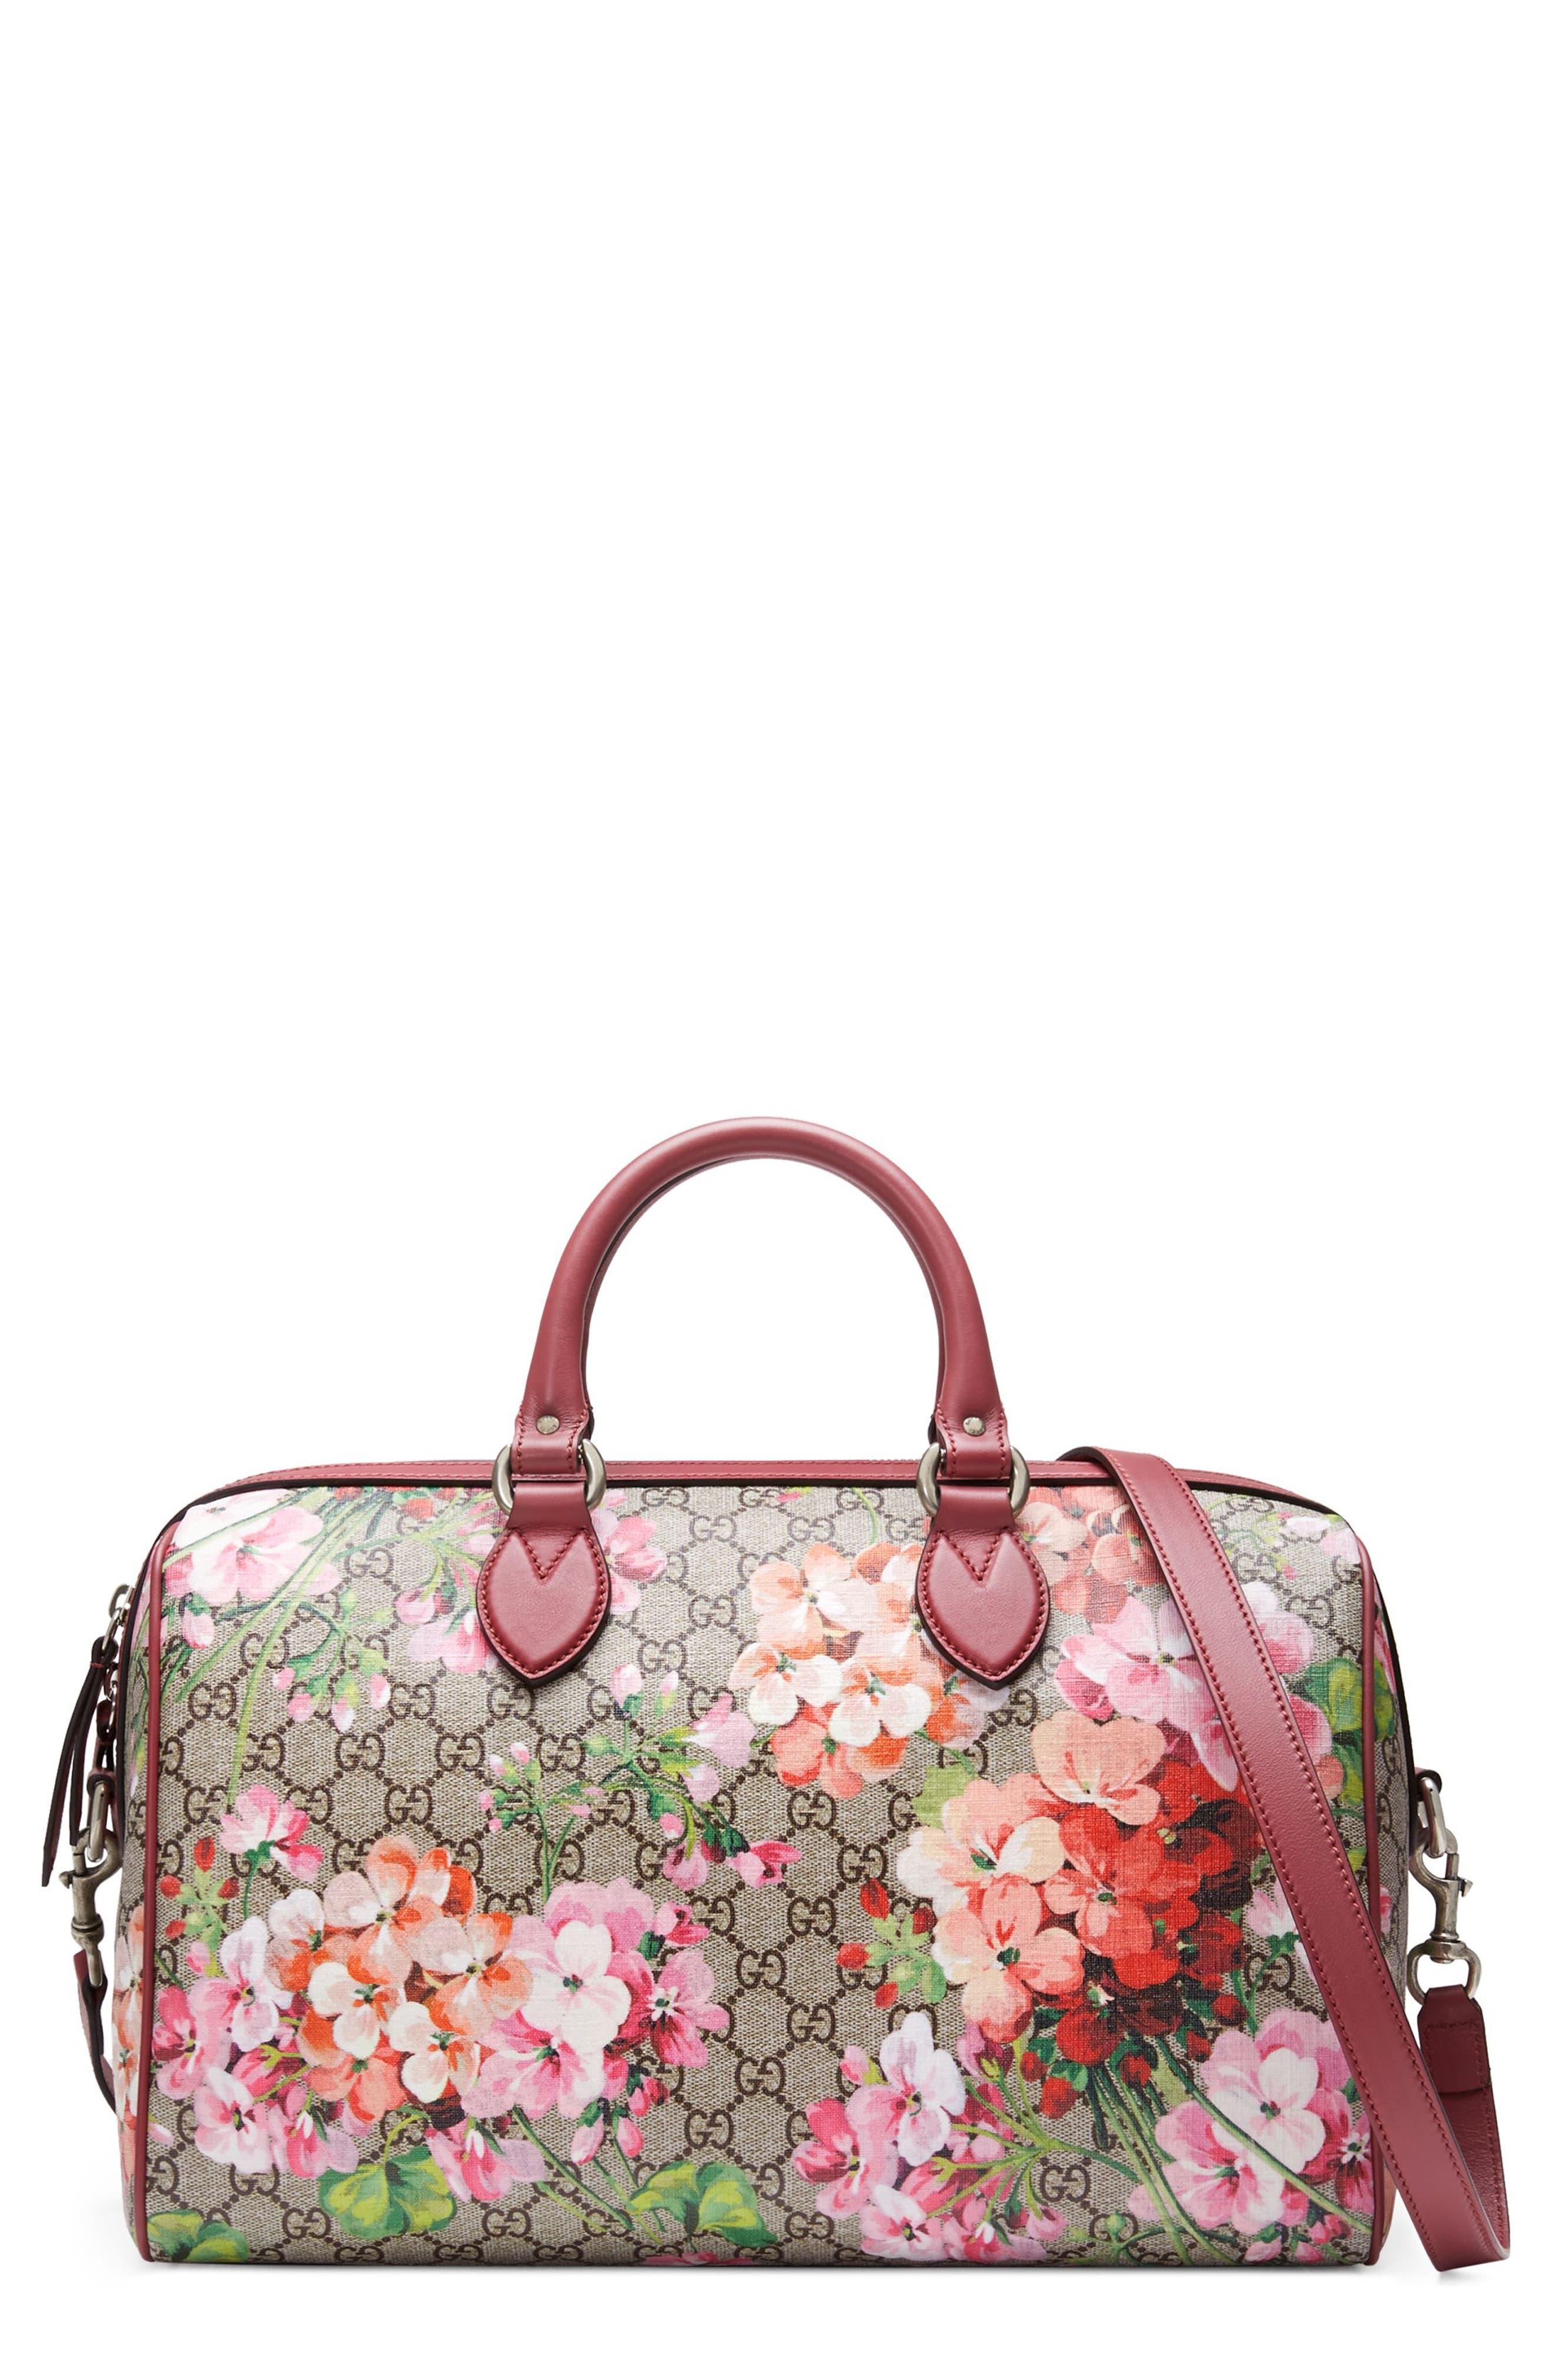 Medium Blooms GG Supreme Top Handle Canvas Bag,                             Main thumbnail 1, color,                             250